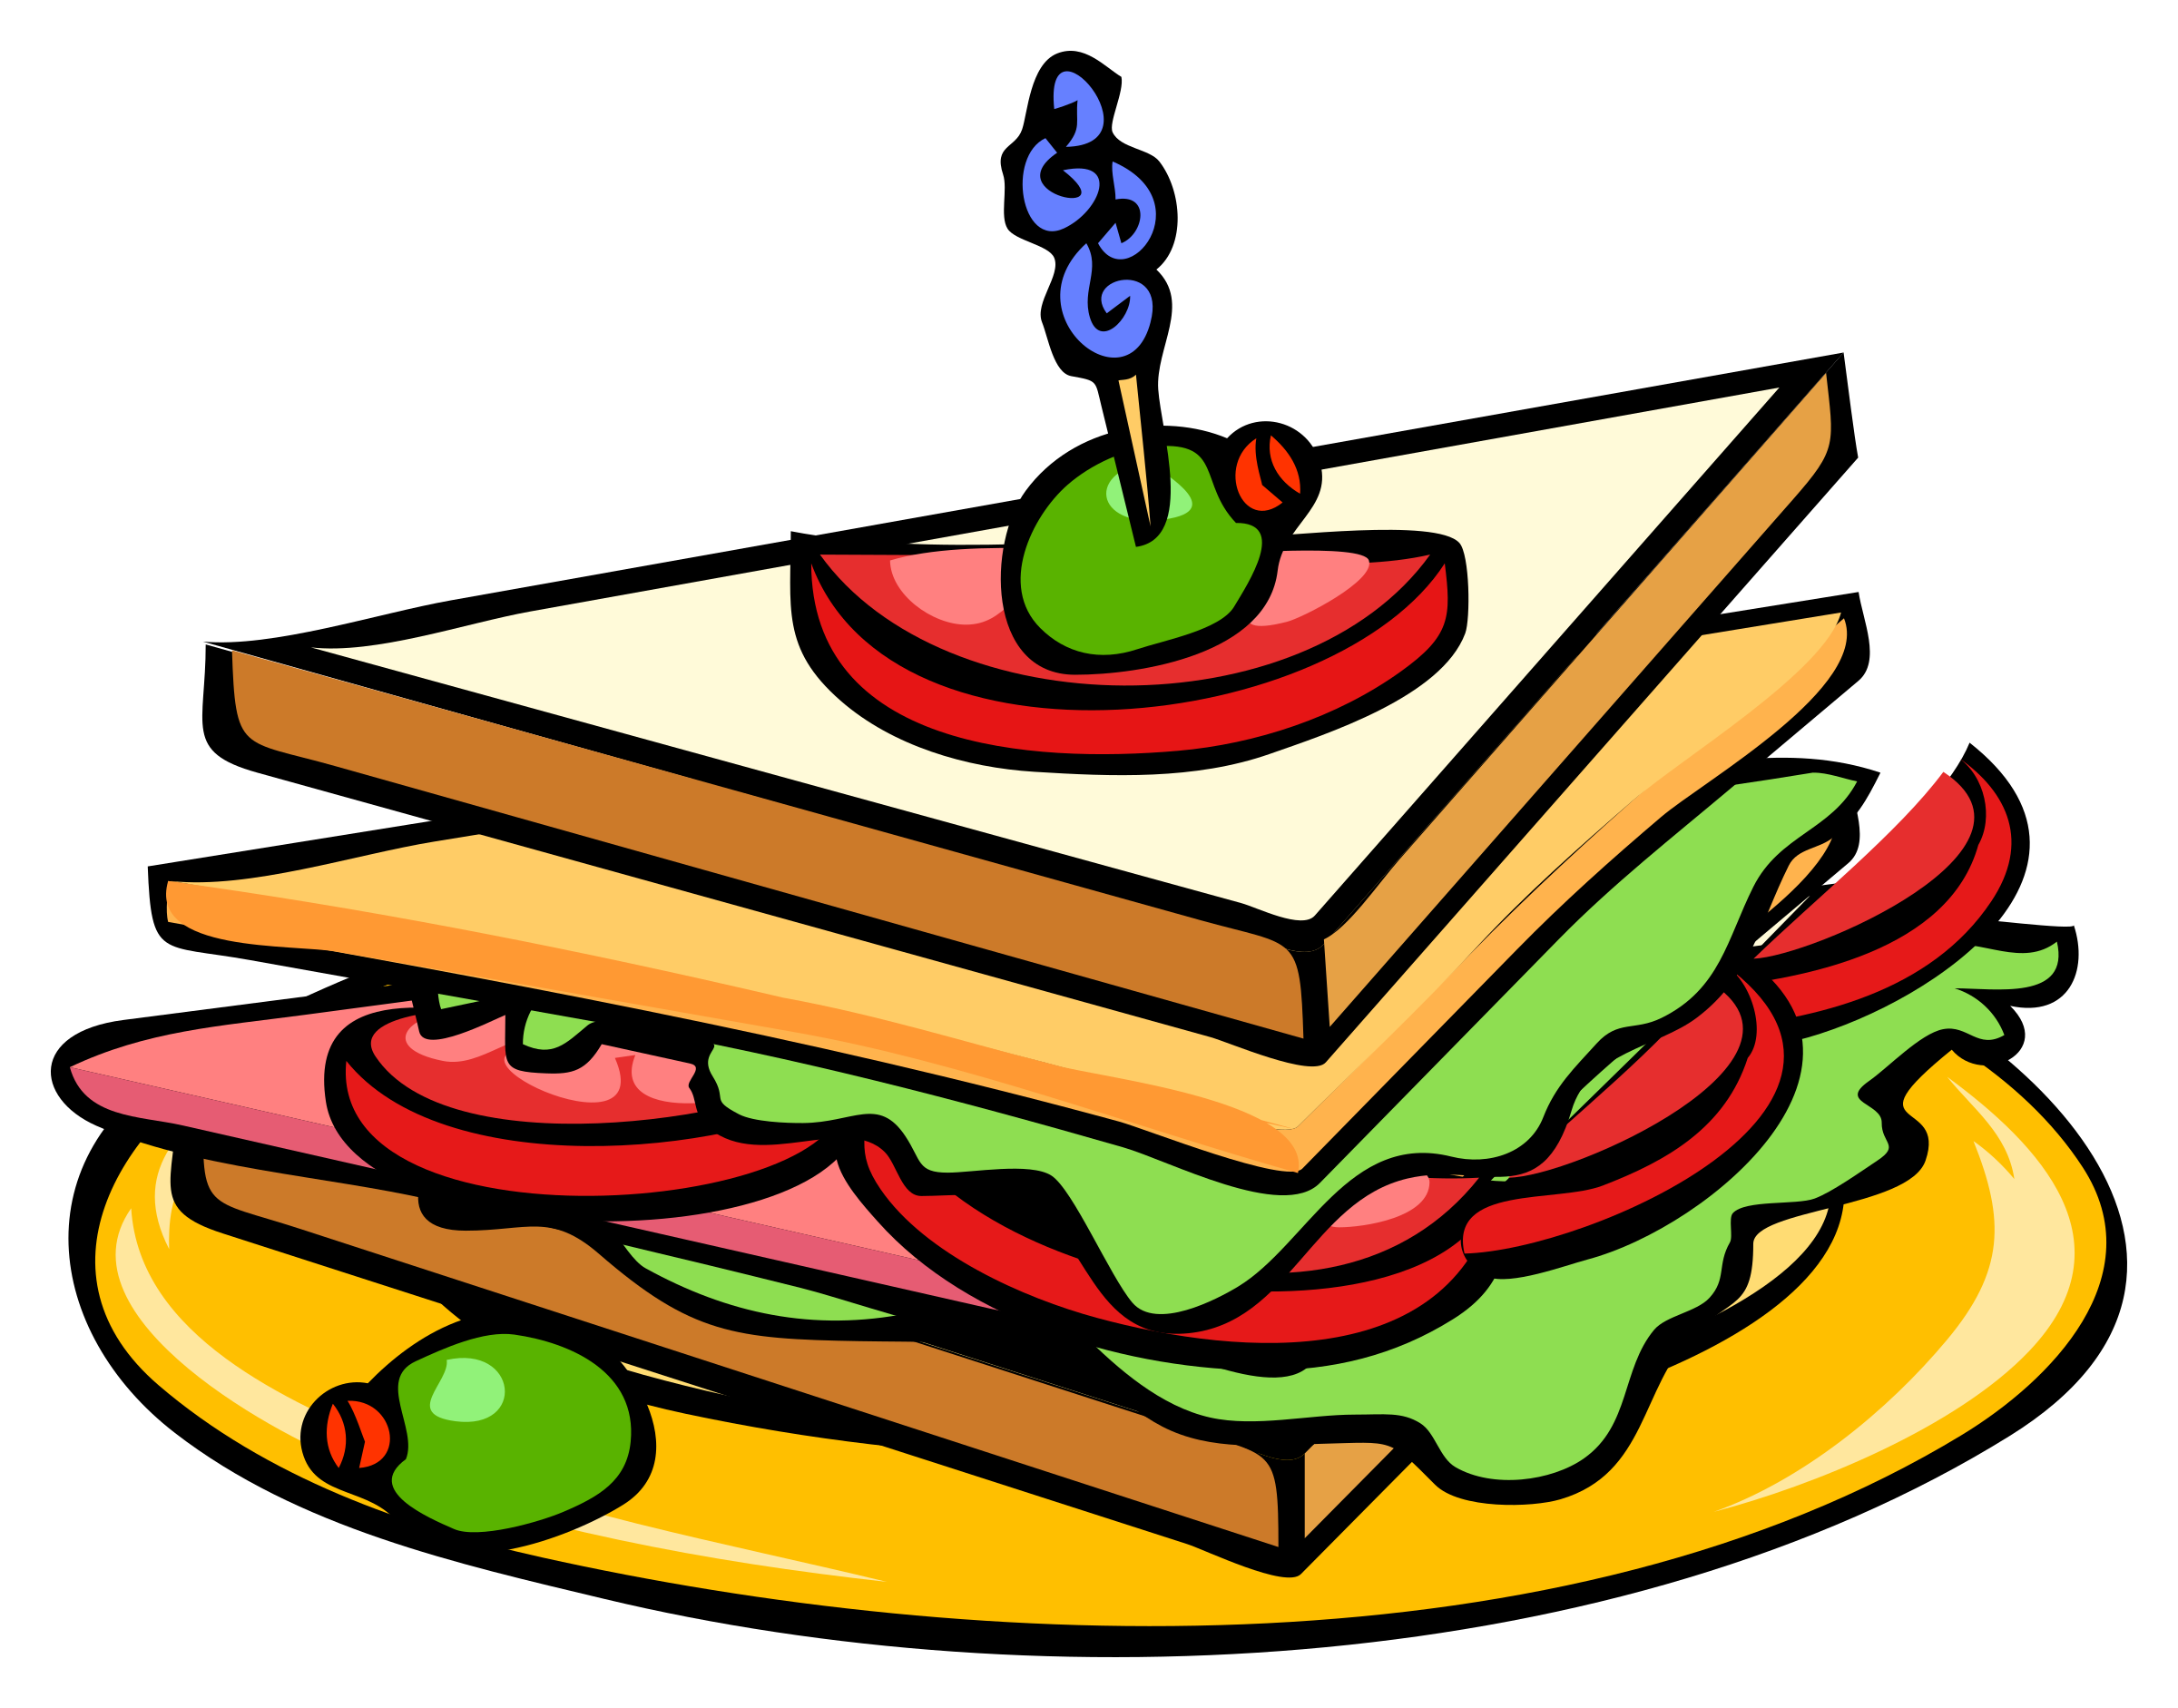 Club clipart sandwitch Free Sandwich Art Clipart sandwich%20clipart